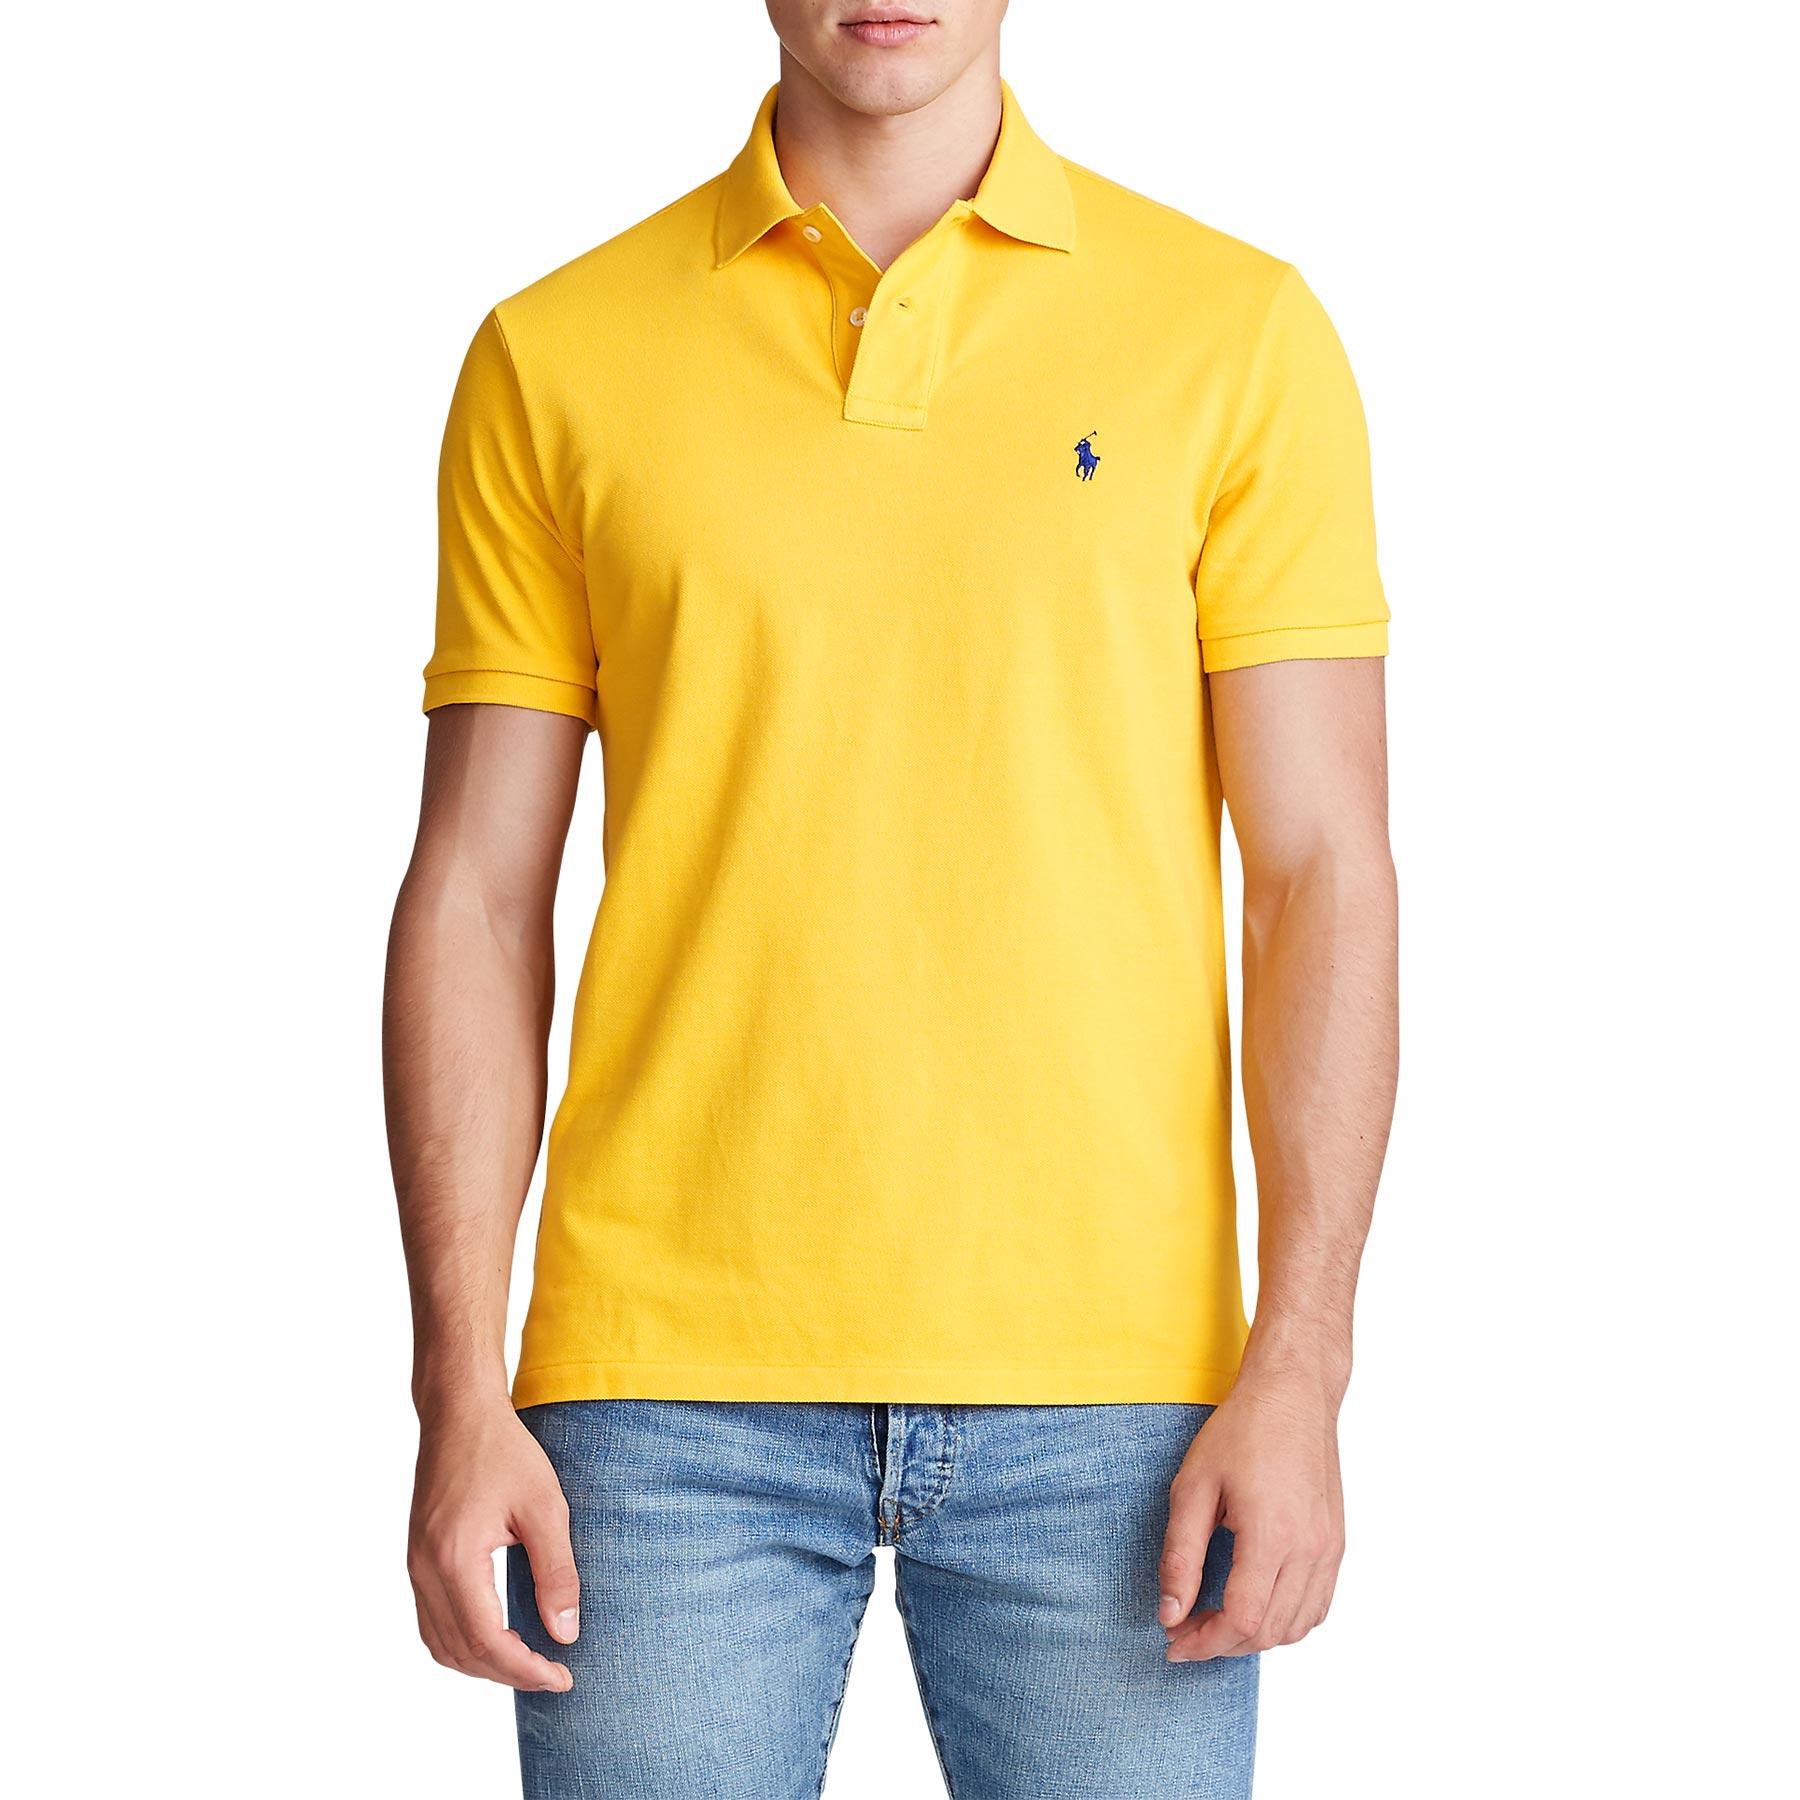 Polo Ralph Lauren Classic Fit Mesh Men's Polo Shirt - Slicker ...